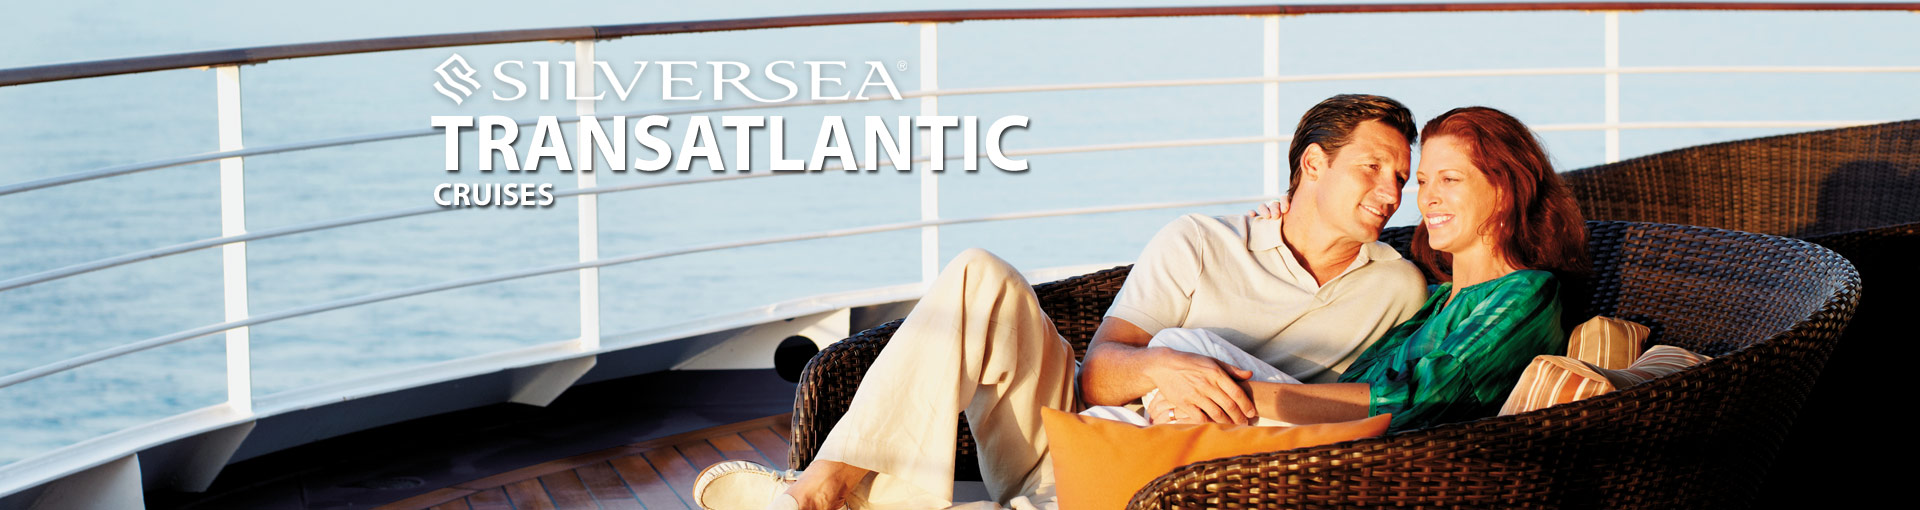 Silversea Cruises Transatlantic Cruises